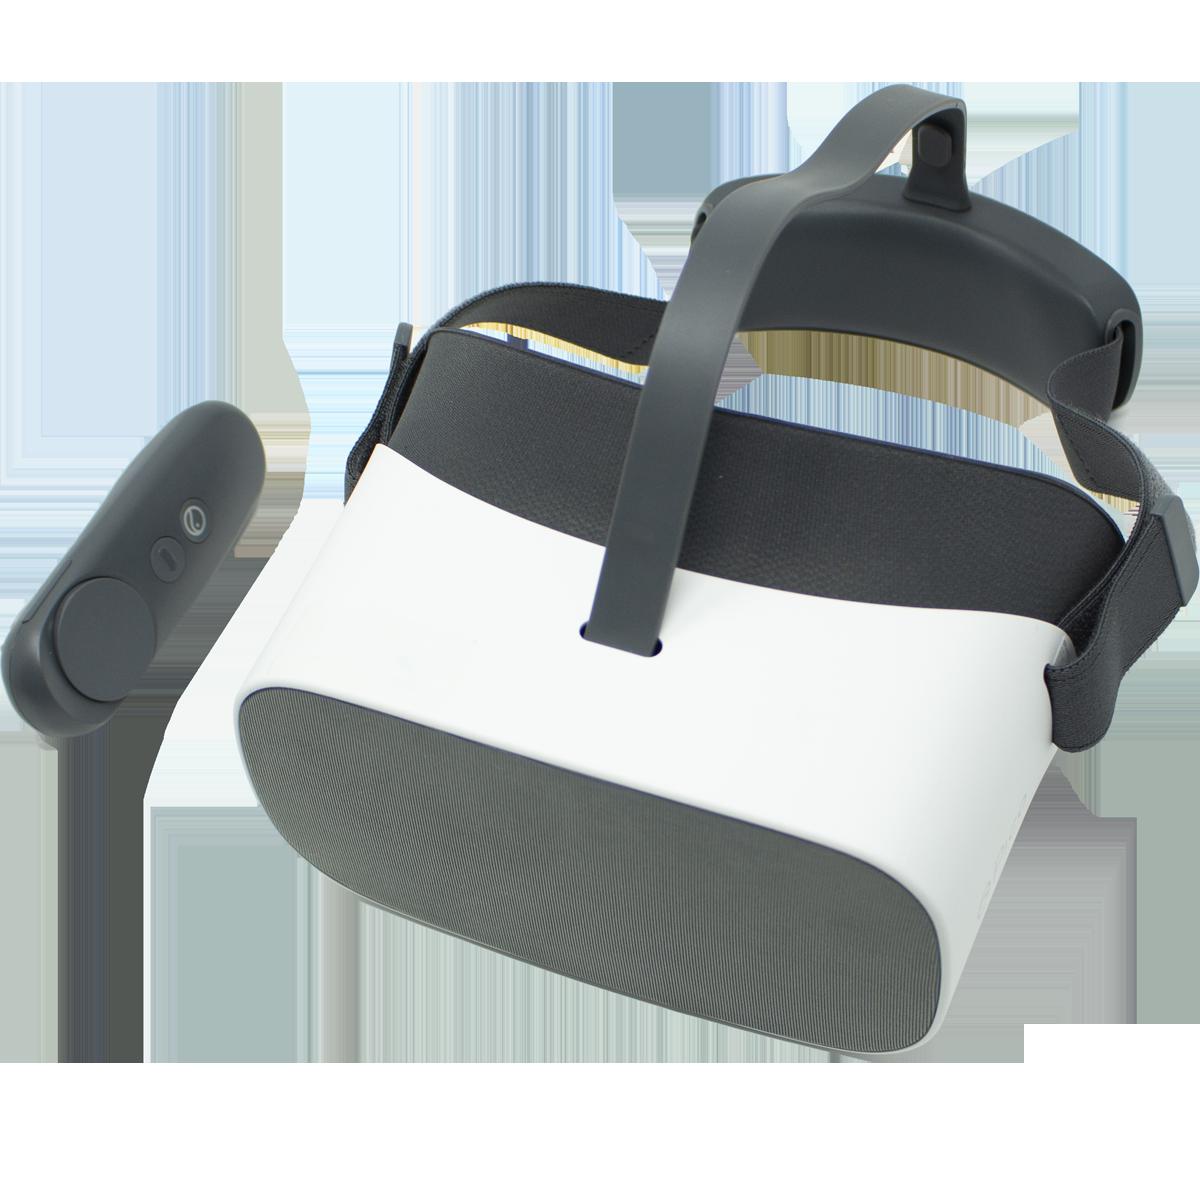 Pico G2 VR-bril